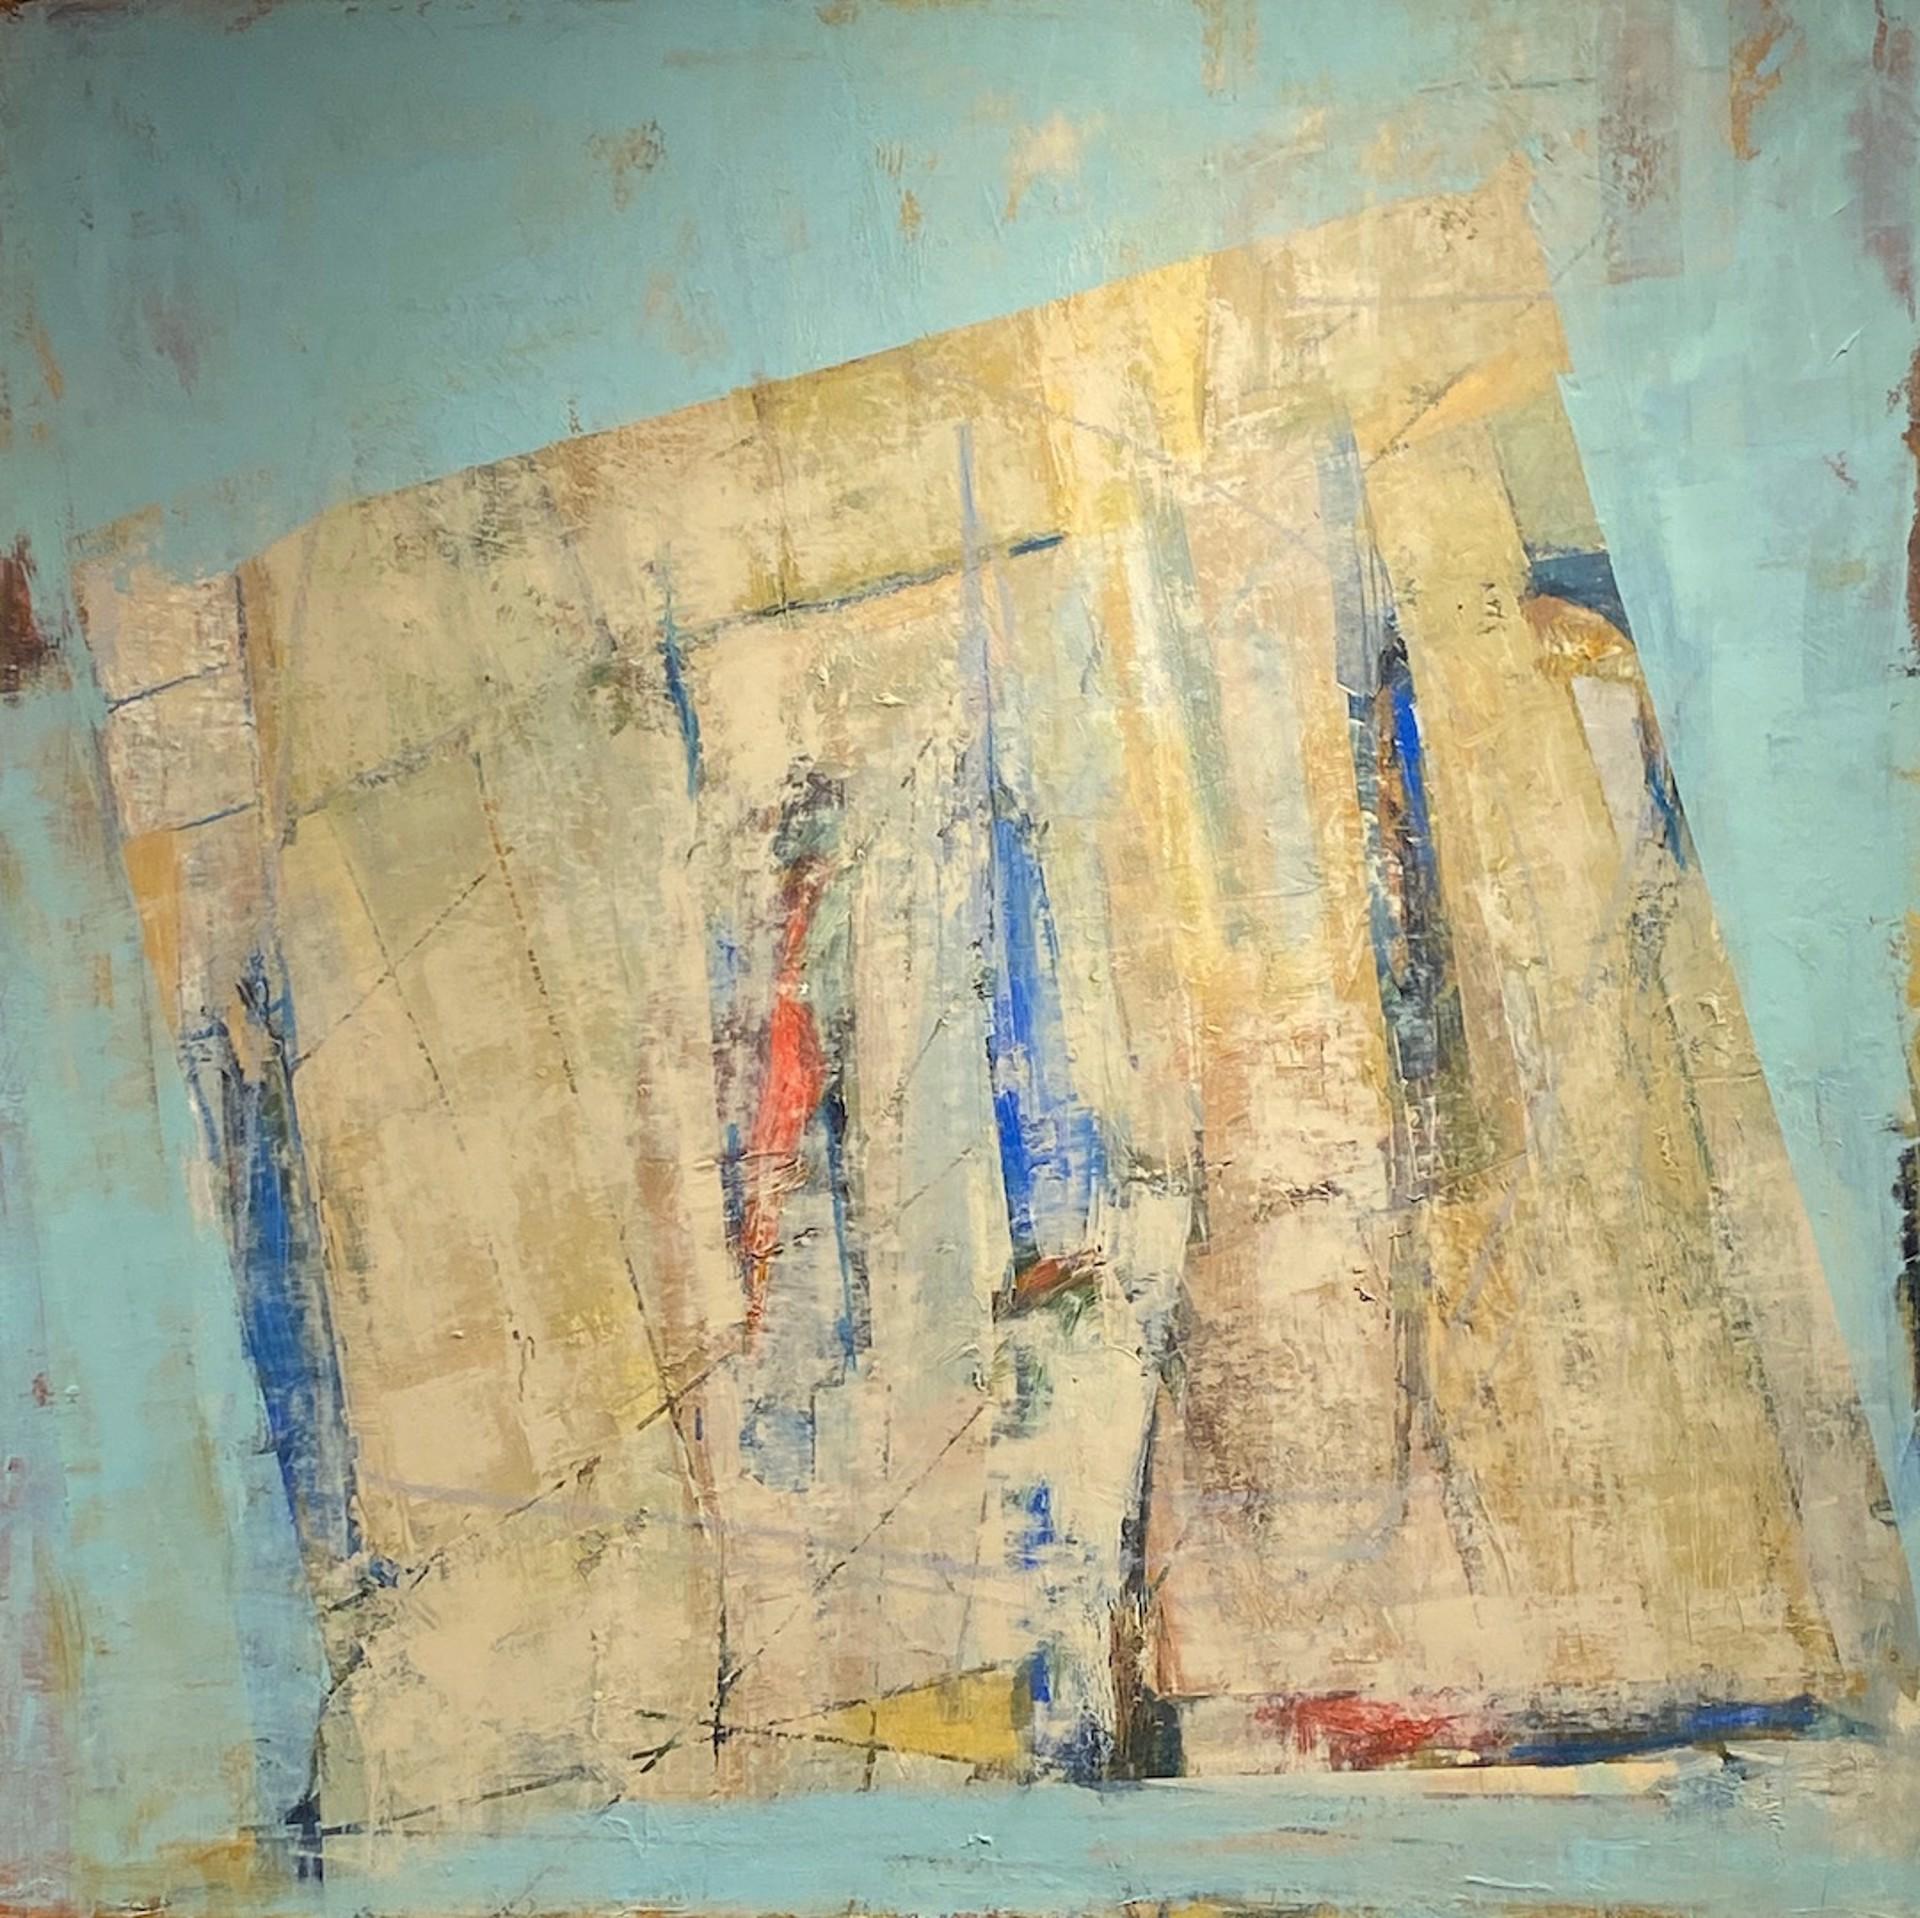 Soffio by Nella Lush